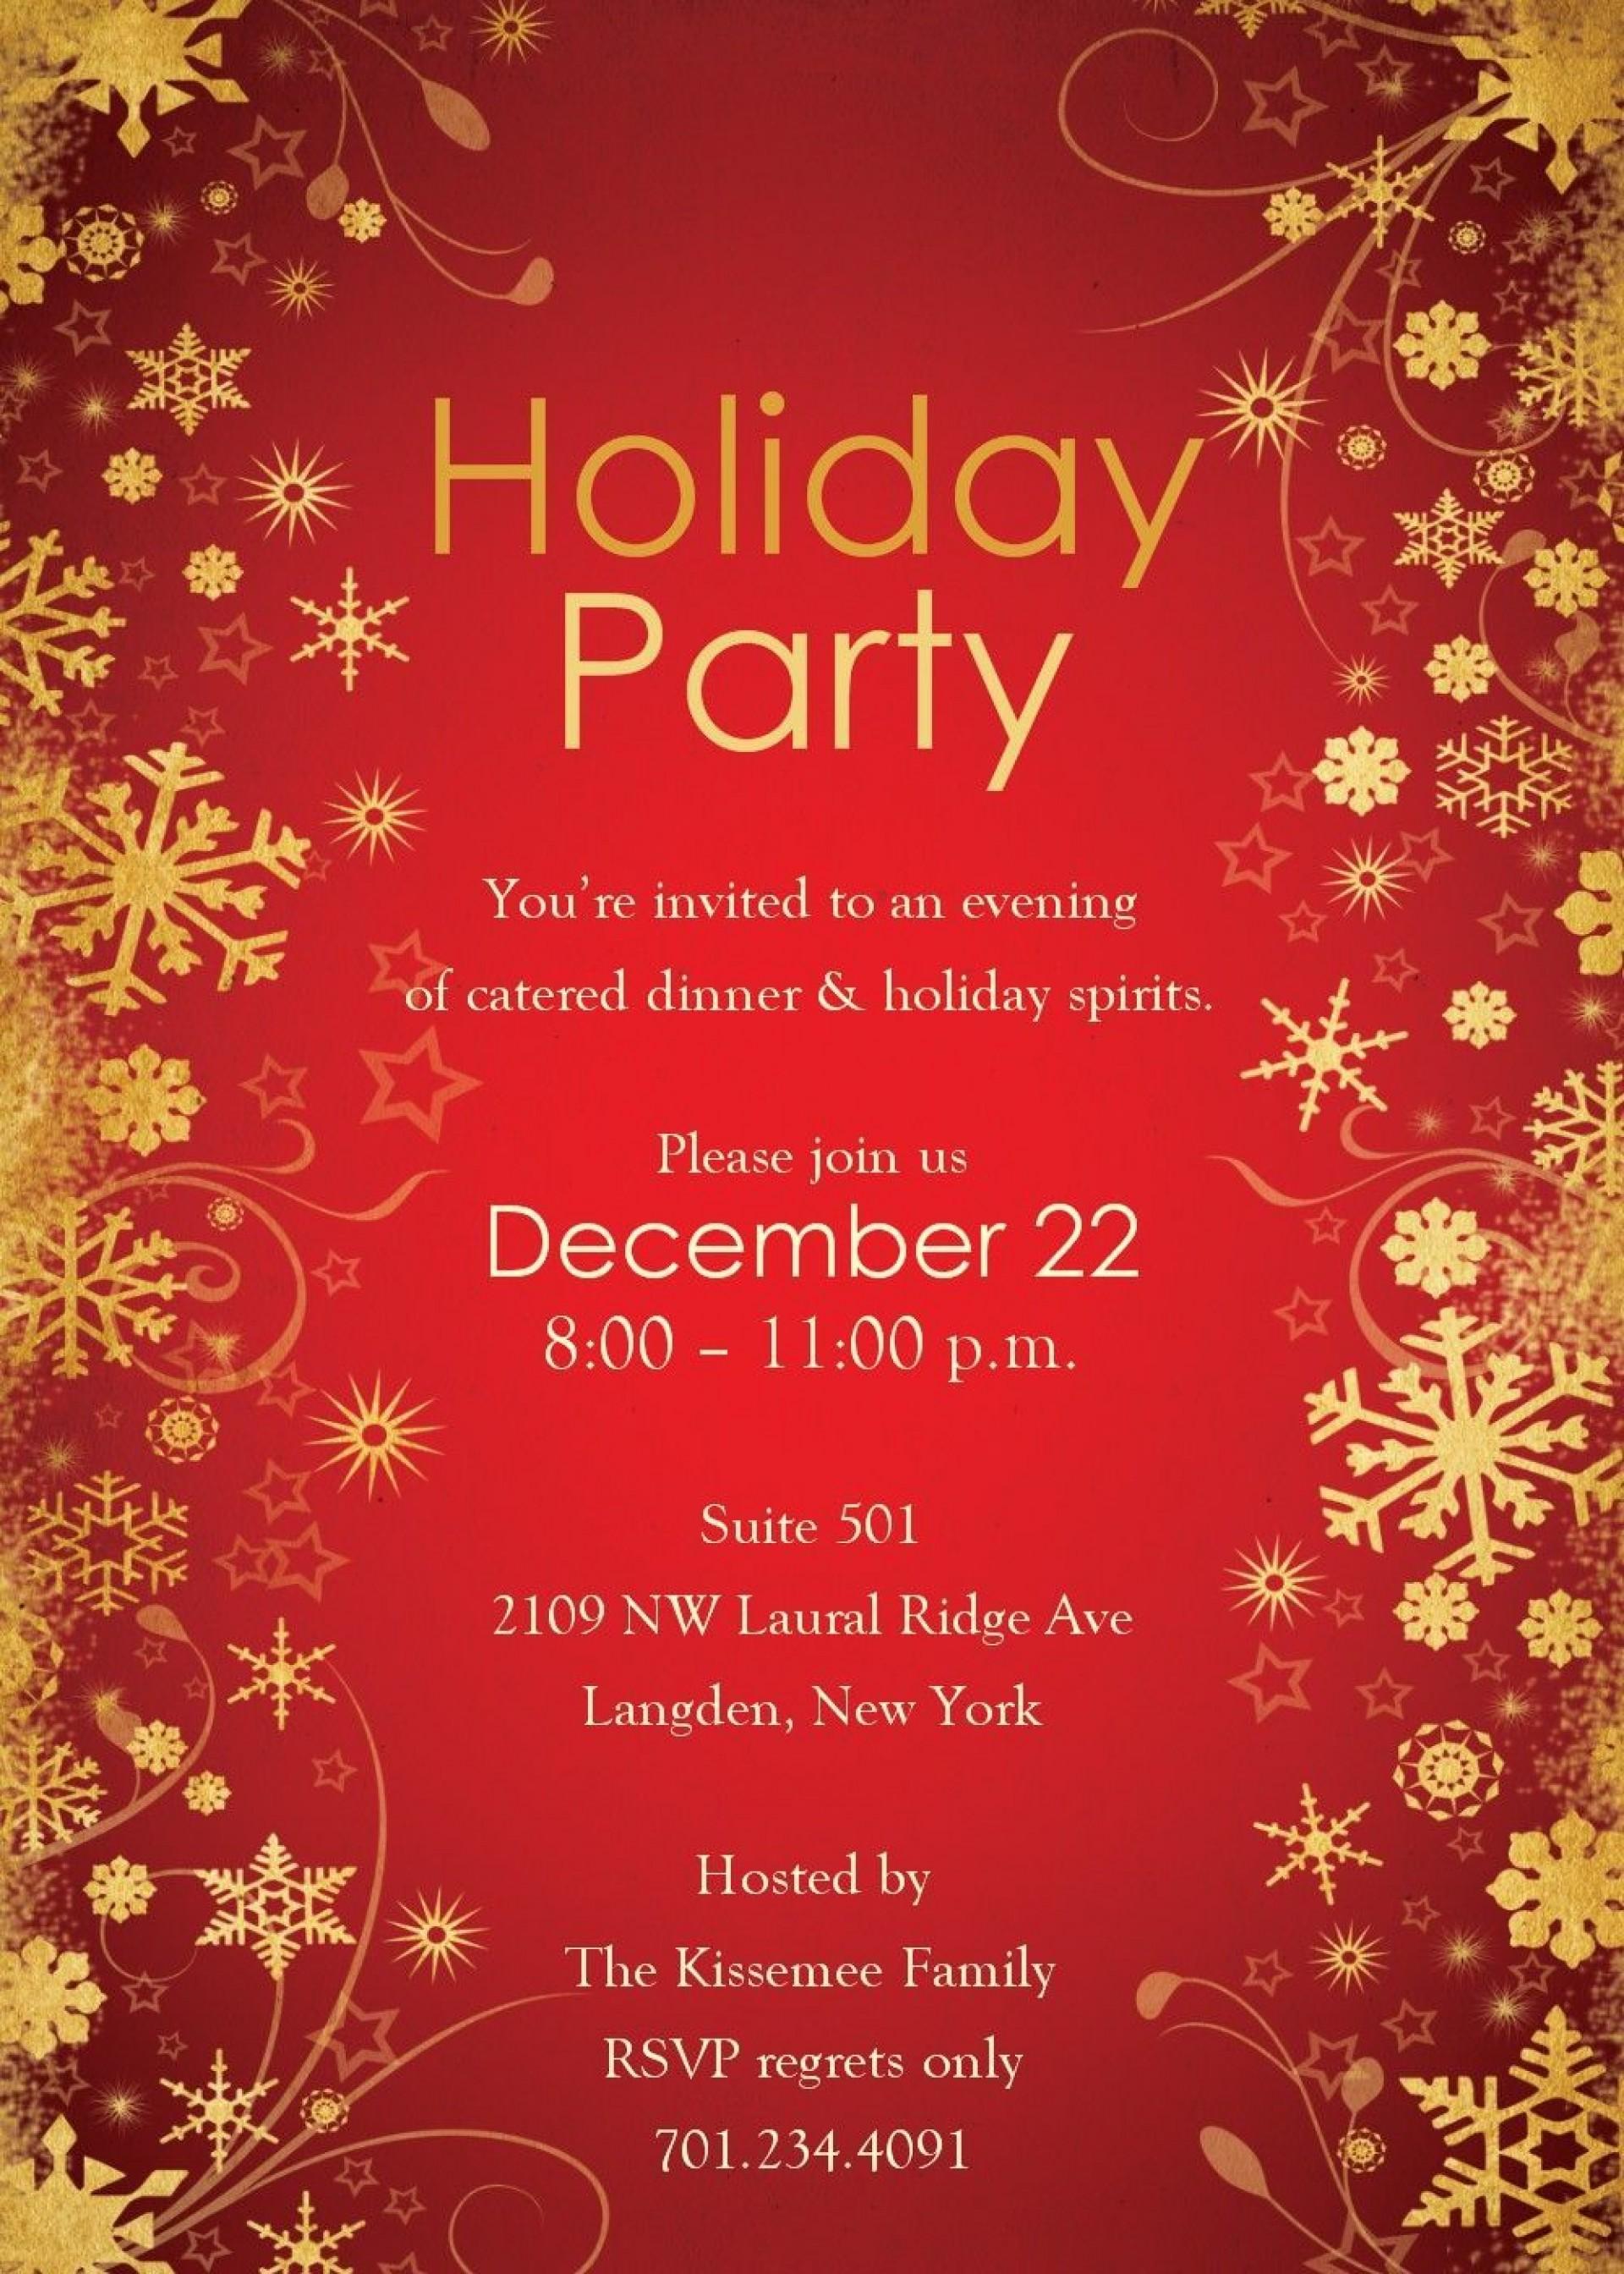 007 Breathtaking Party Invite Template Word Design  Holiday Invitation Wording Sample Retirement Free Editable1920